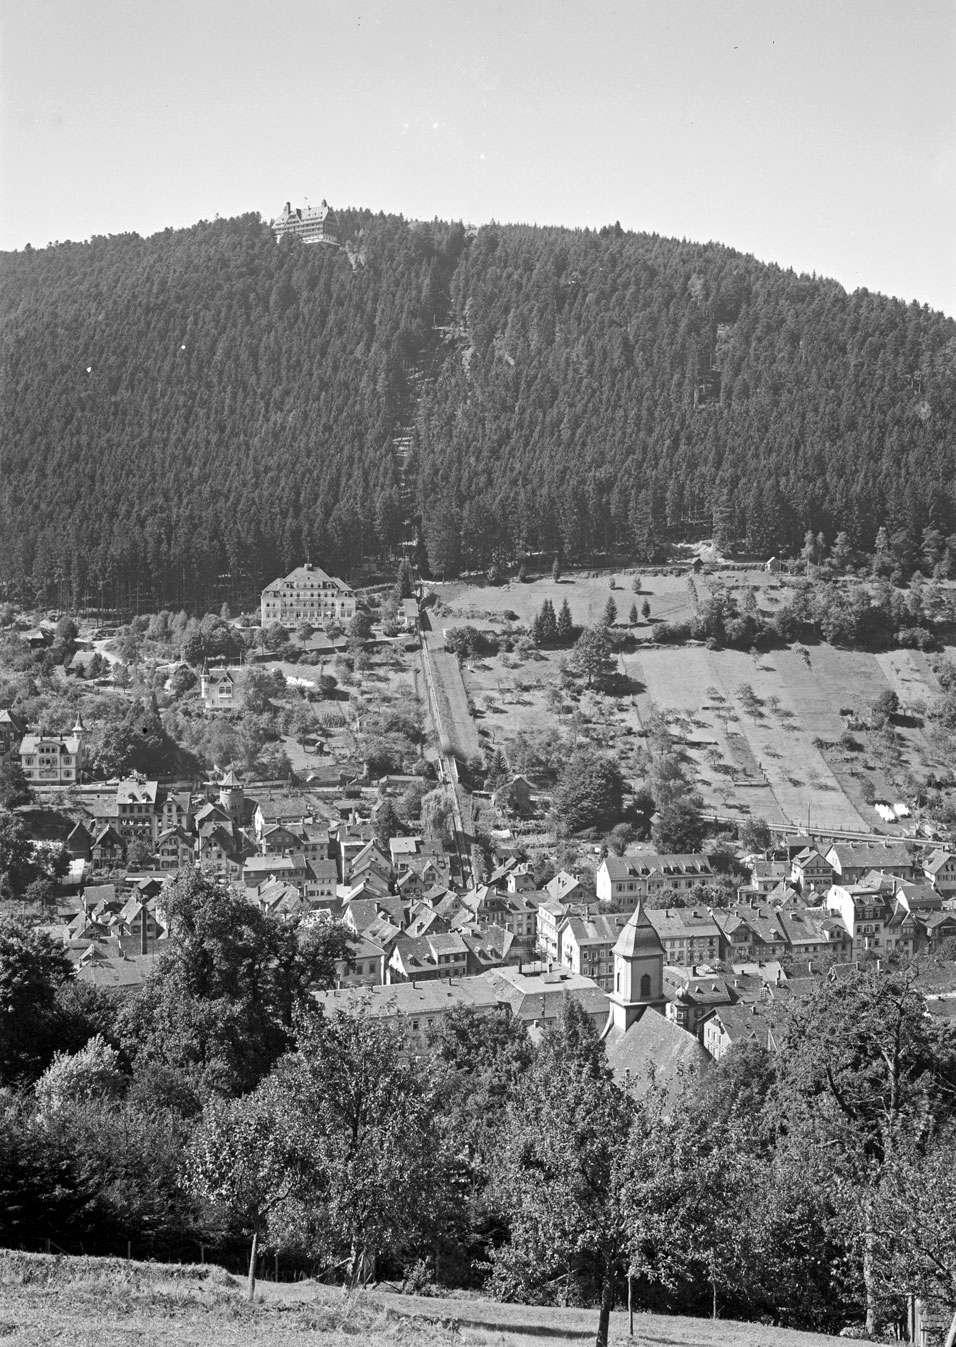 Dokumentation Wildbad und Calmbach, Nr 002